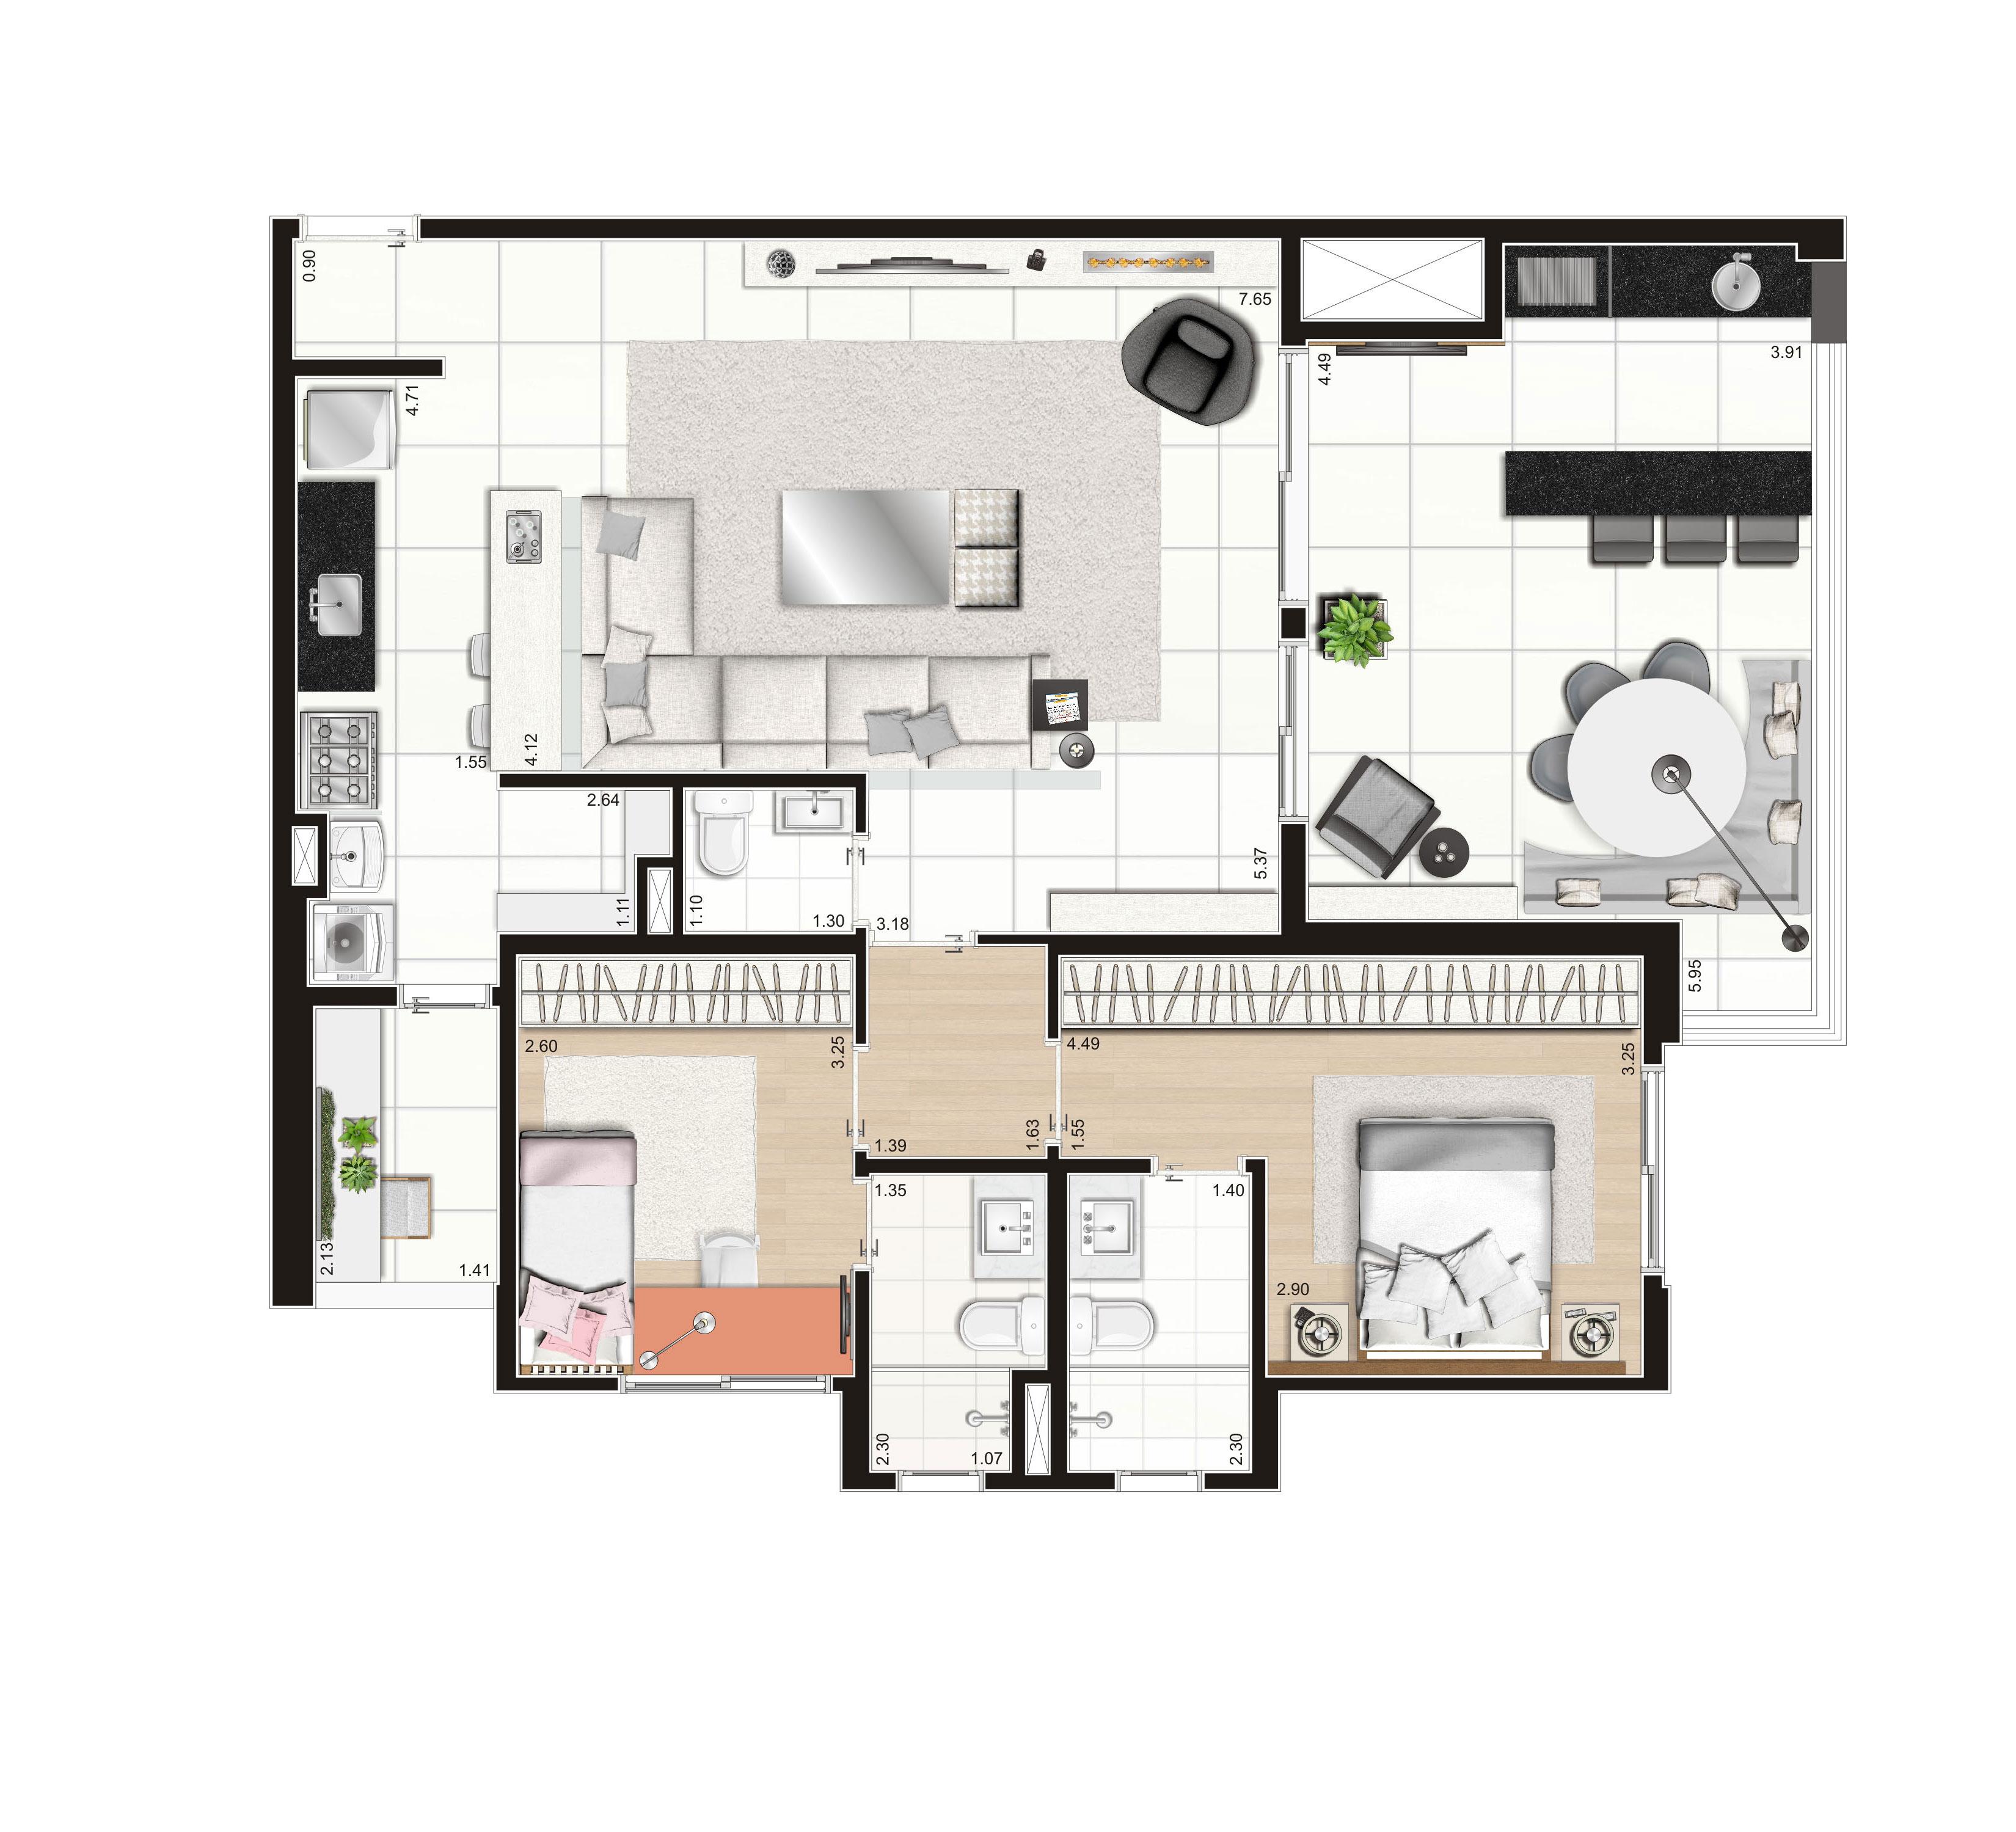 108 m² -  2 dorms